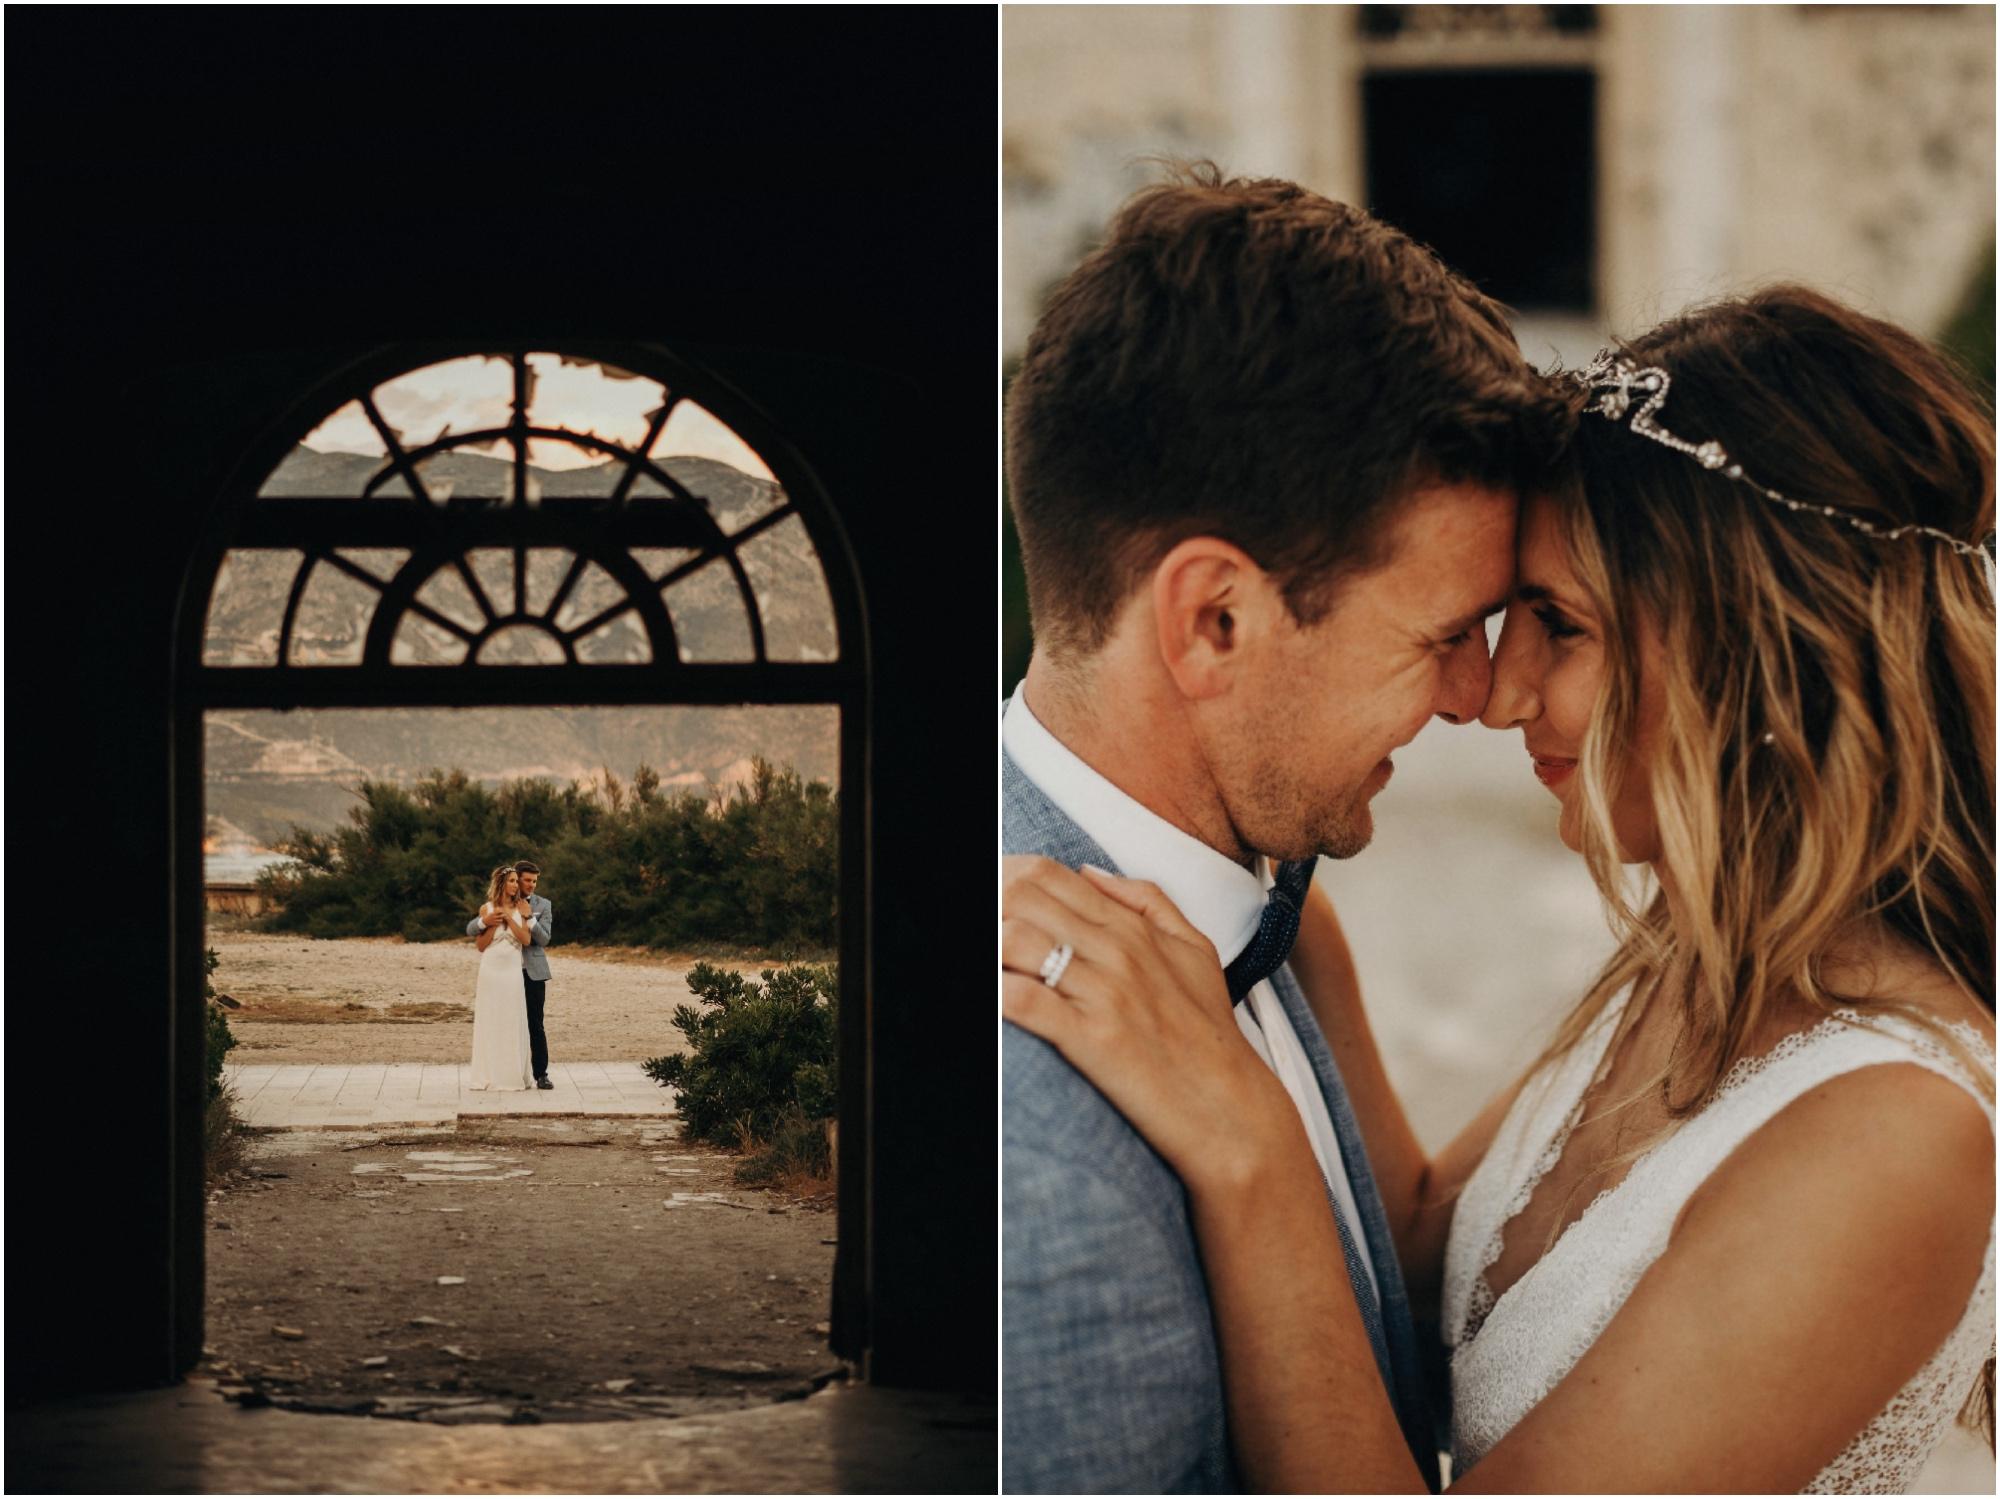 dubrovnik_croatia_wedding_photographer-jere_satamo-destination_weddings-200-web.jpg